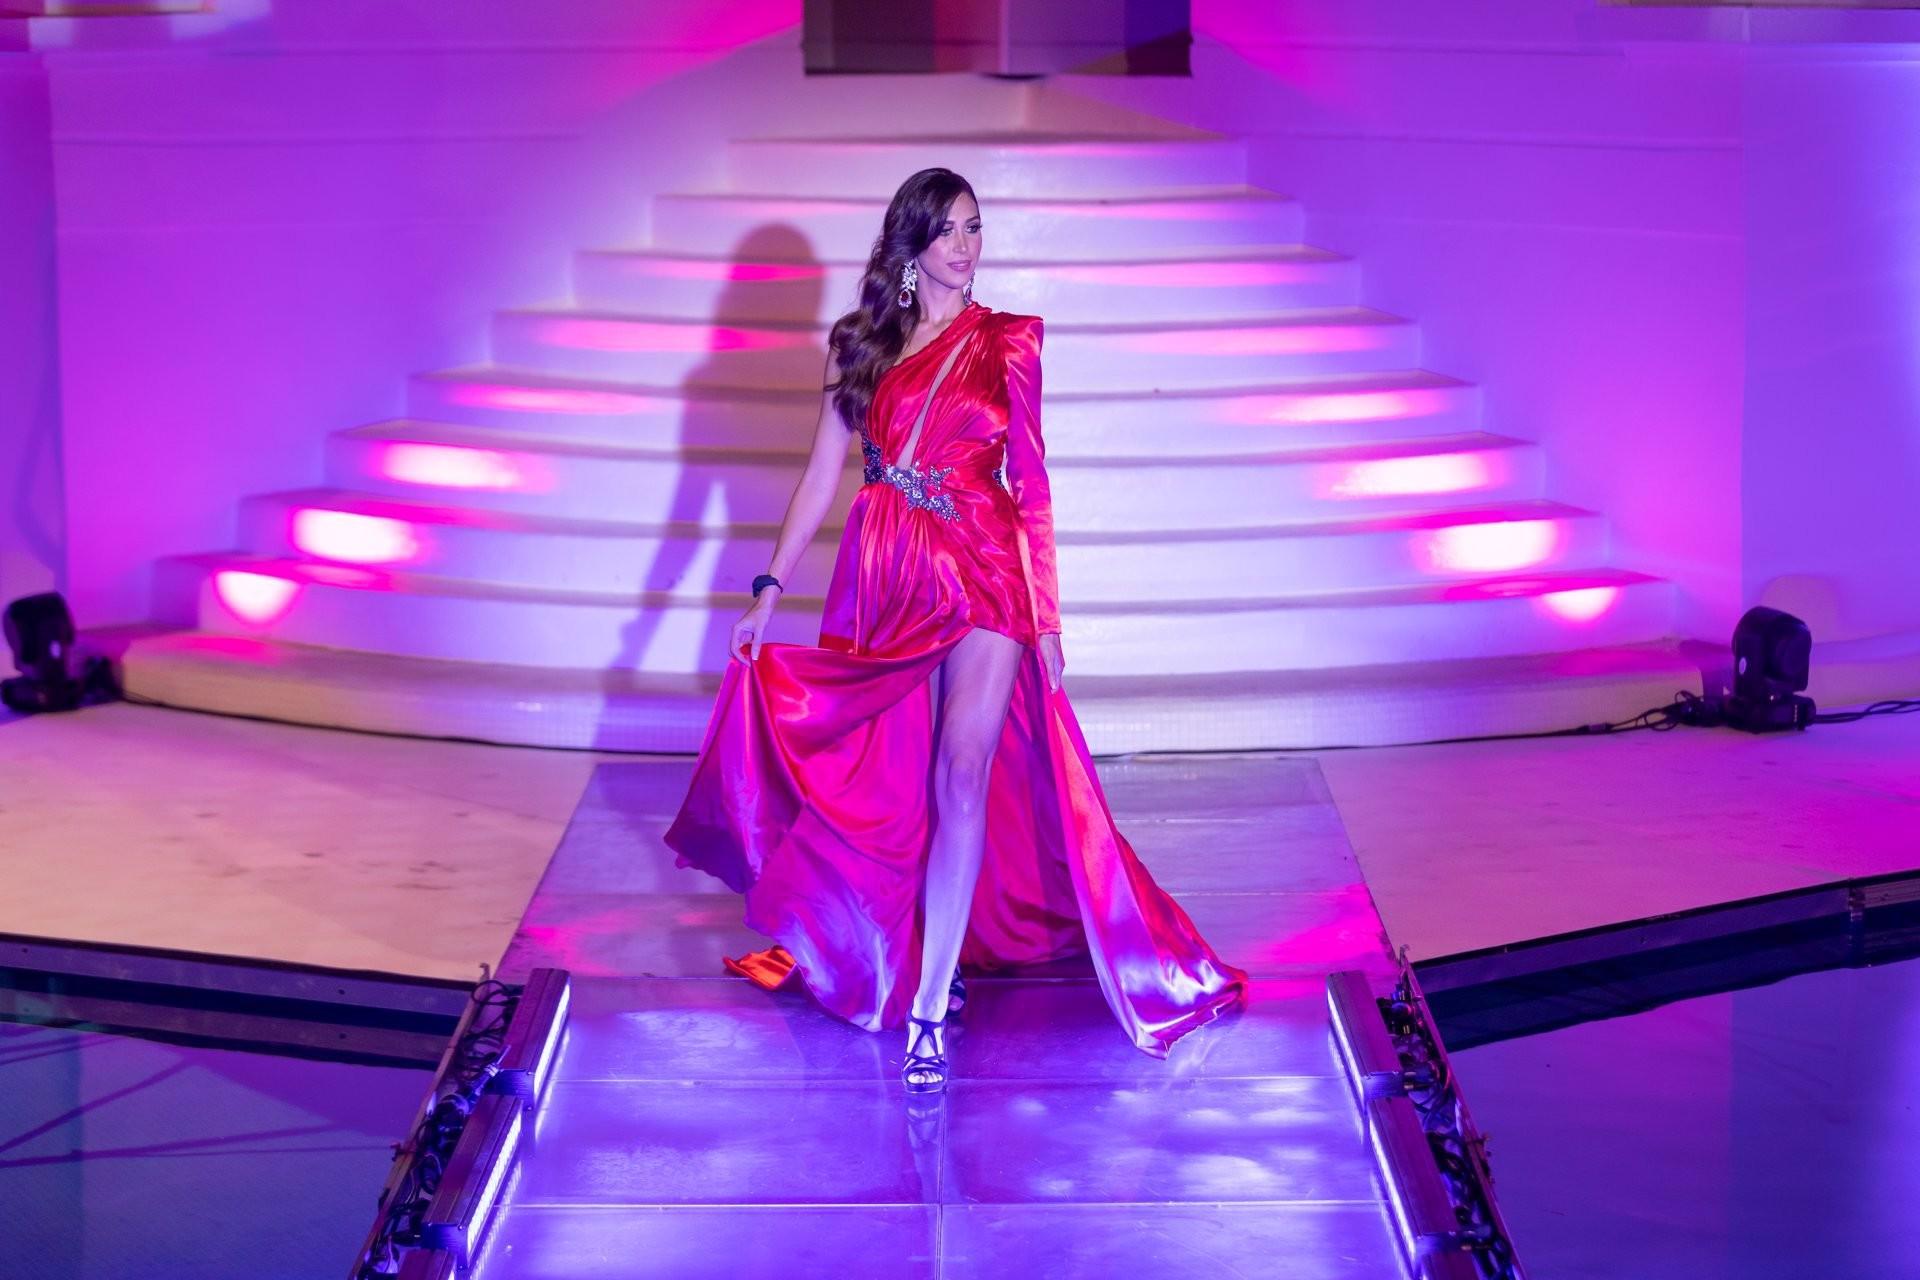 andrea-martinez-miss-universo-espana-2020-1.jpg